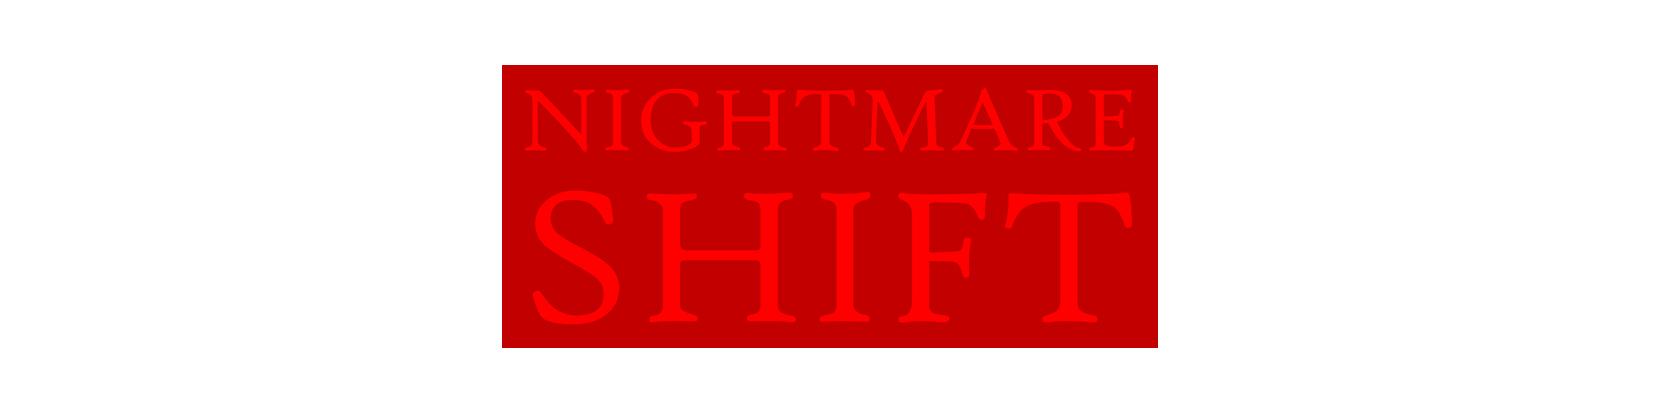 Nightmare Shift